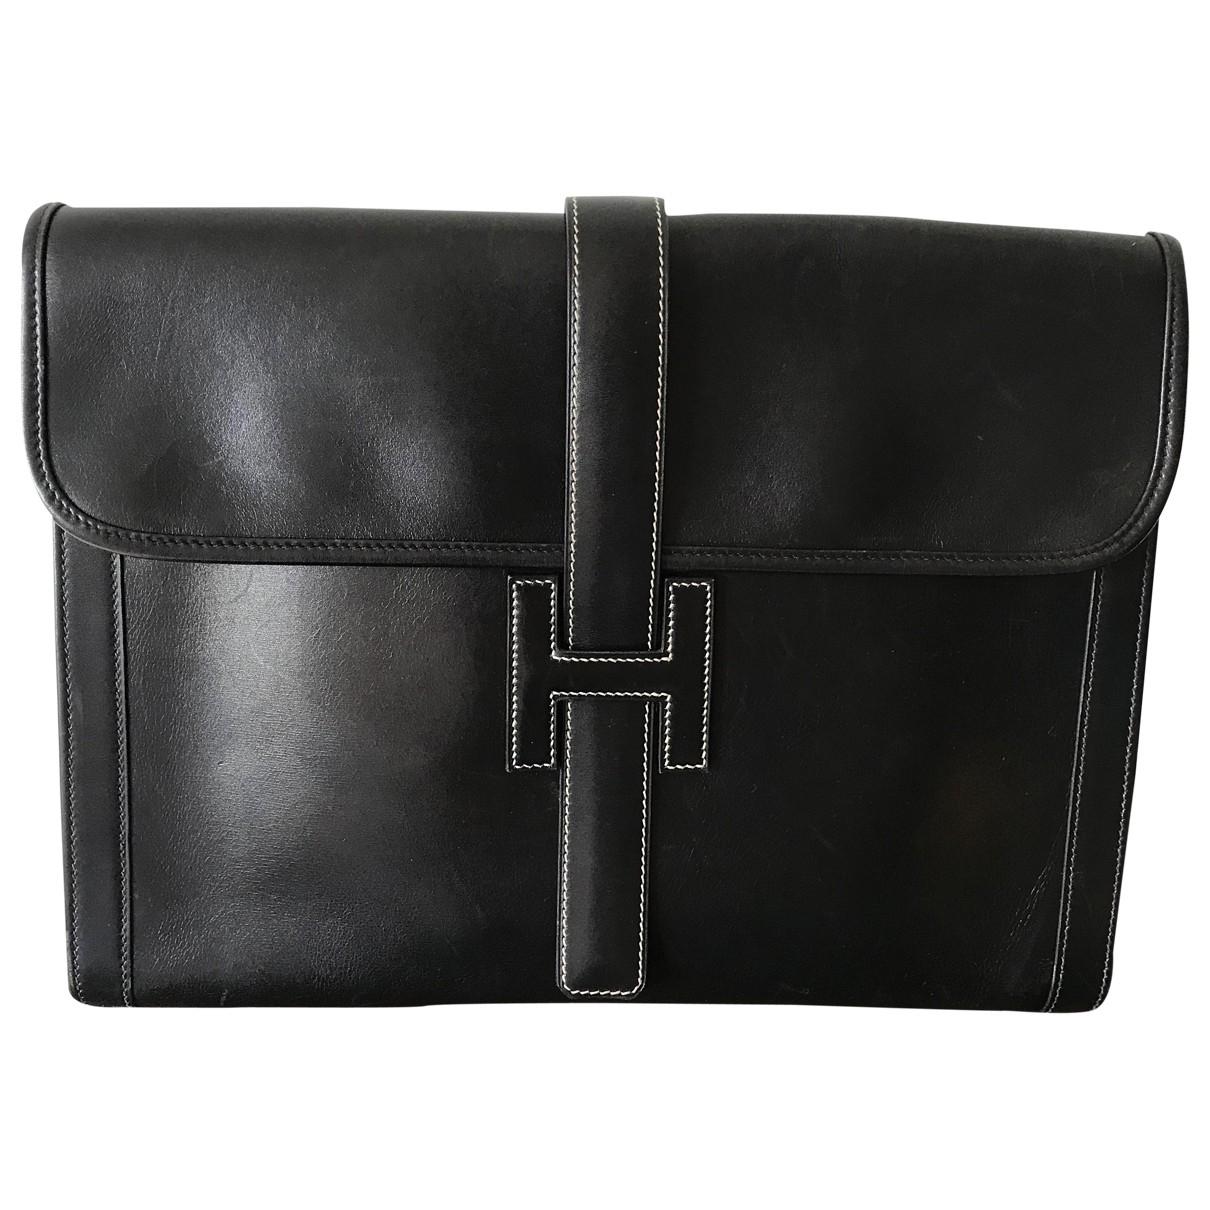 Hermès Jige Black Leather Clutch bag for Women \N